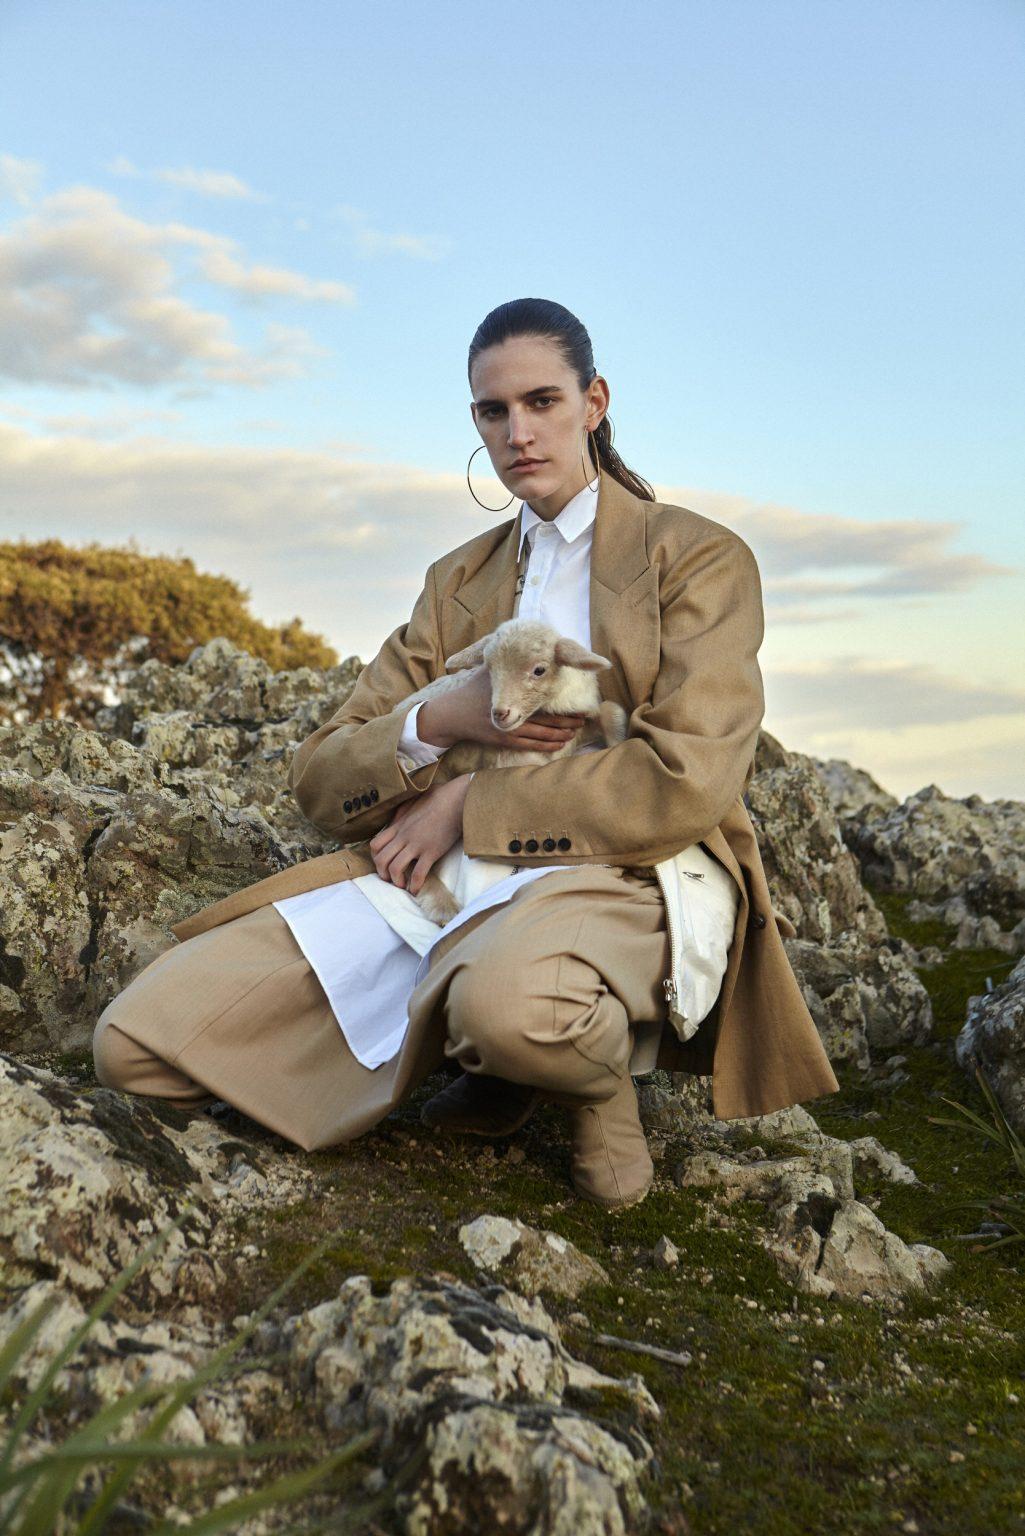 encens-magazinerivista-francesefrench-fashion-magazine